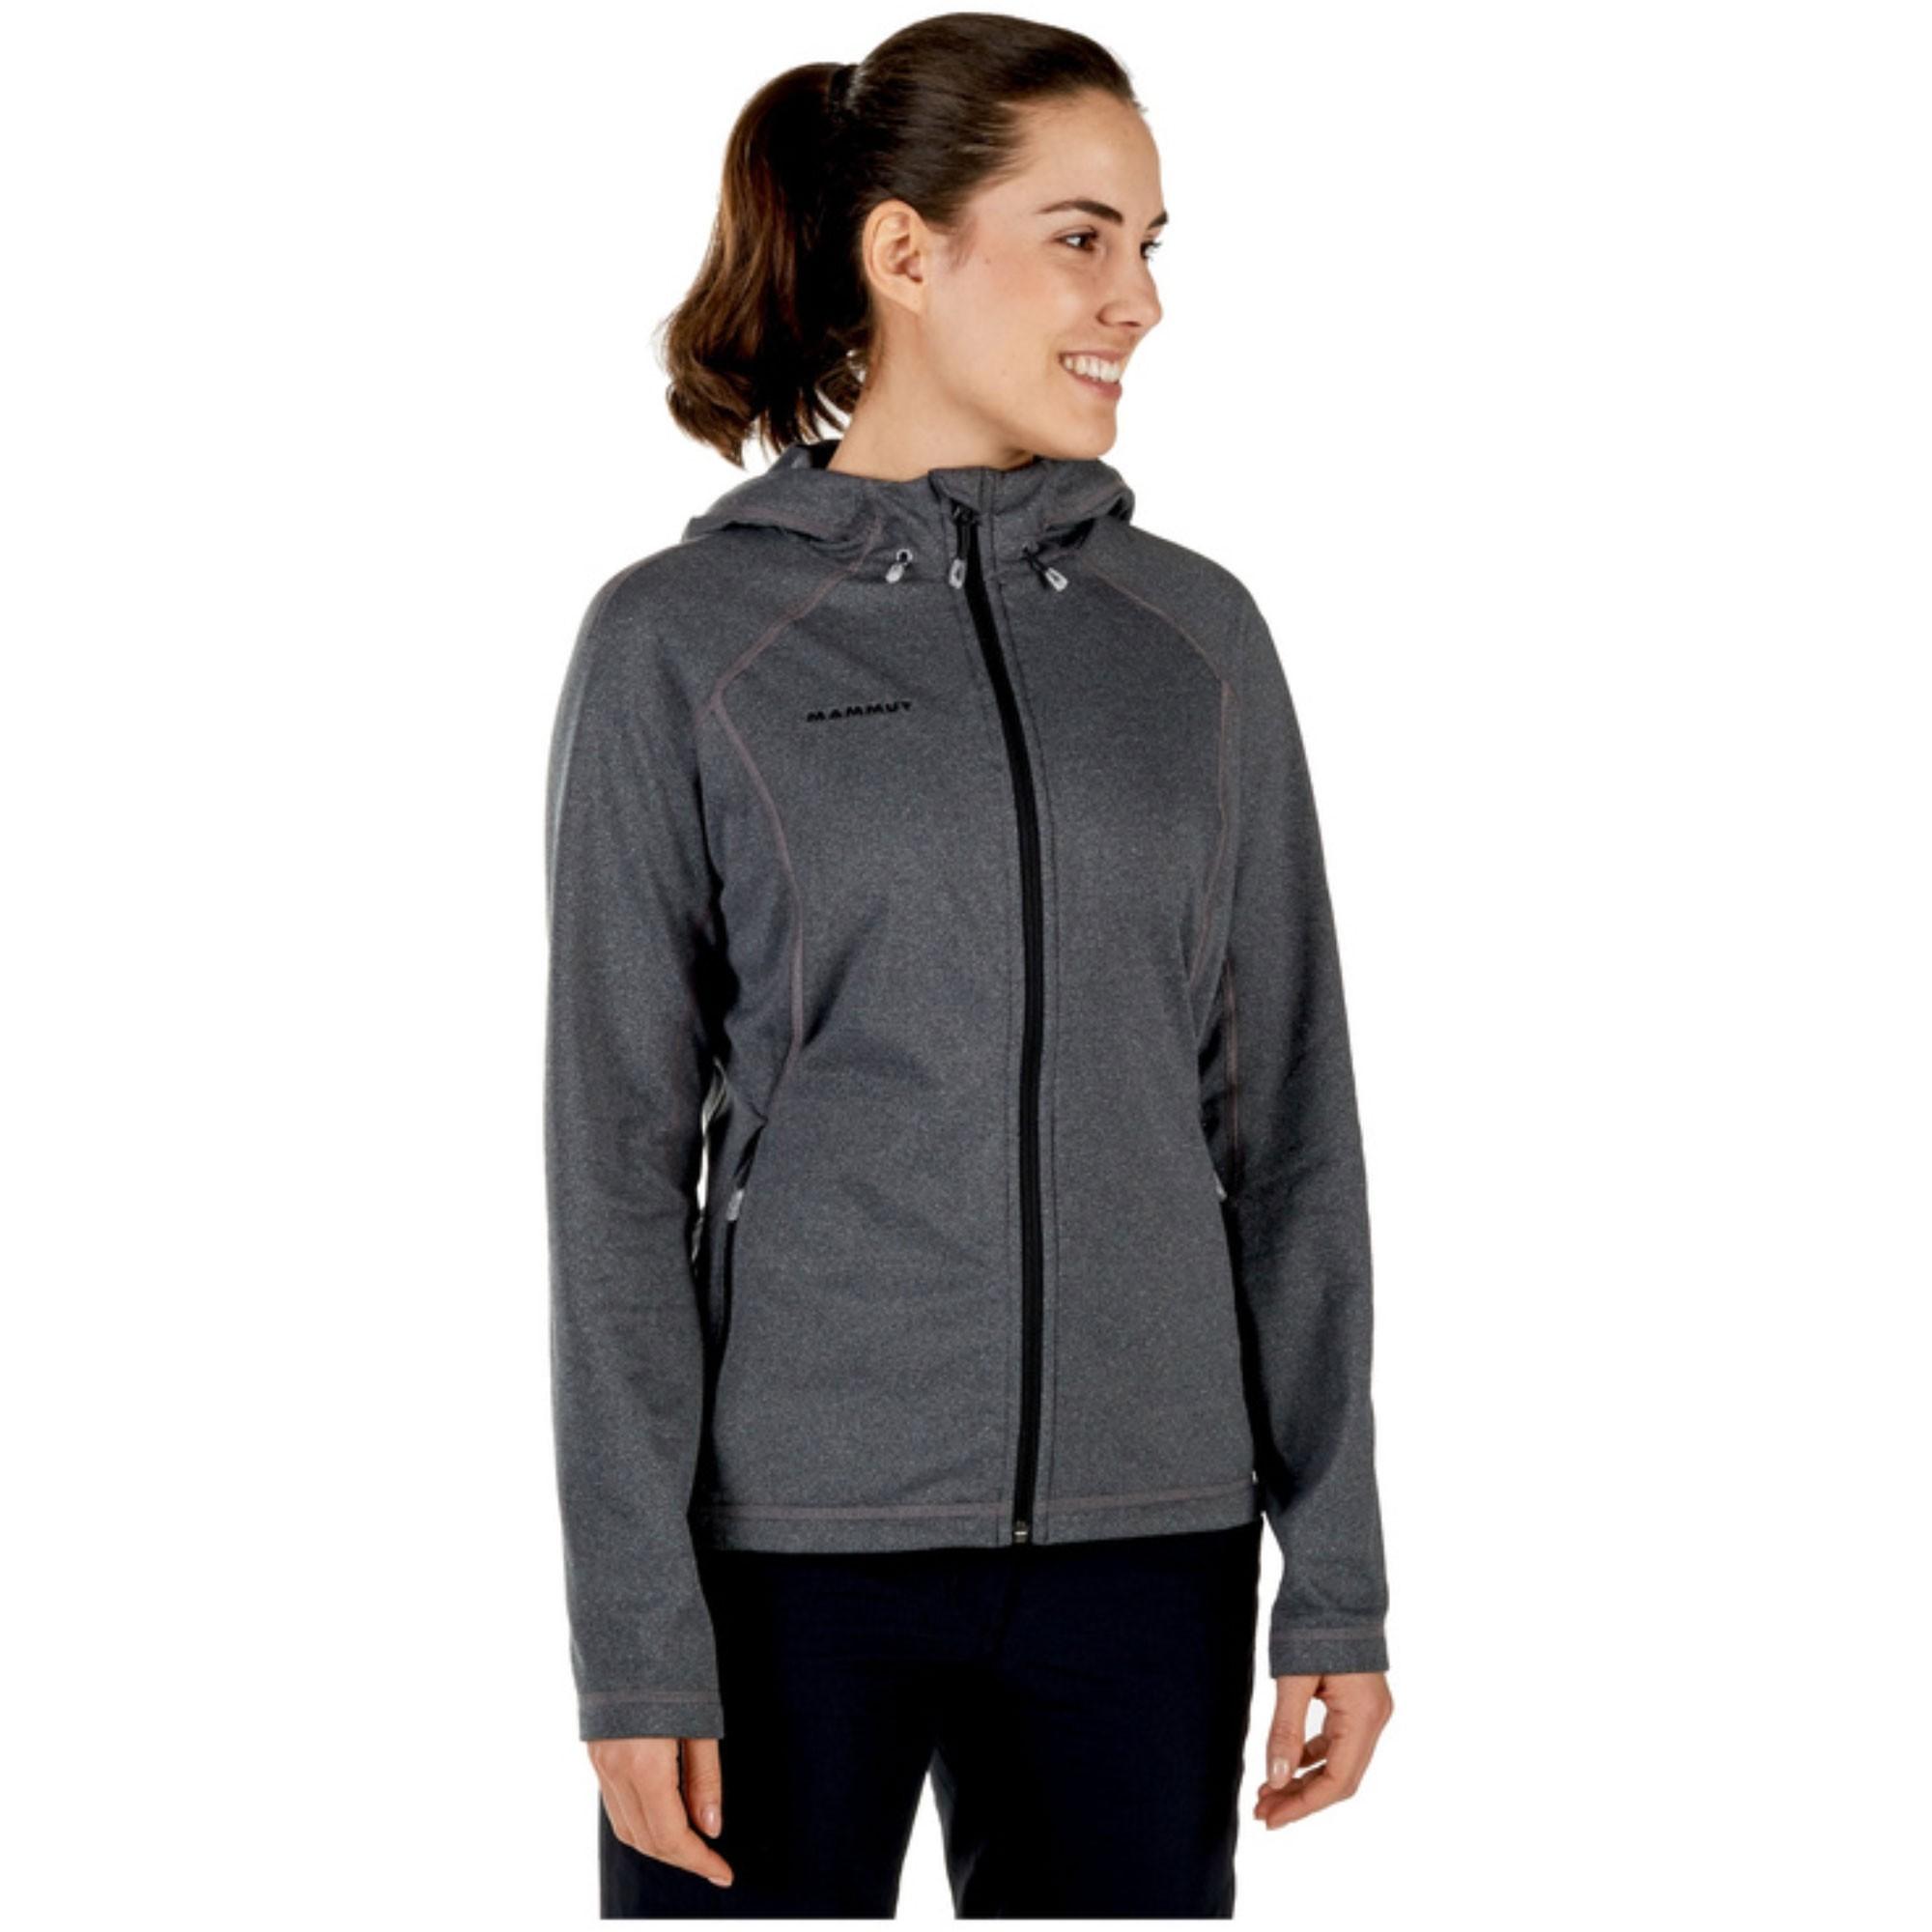 Mammut Runbold ML Women's Hooded Fleece Jacket - Black Melange